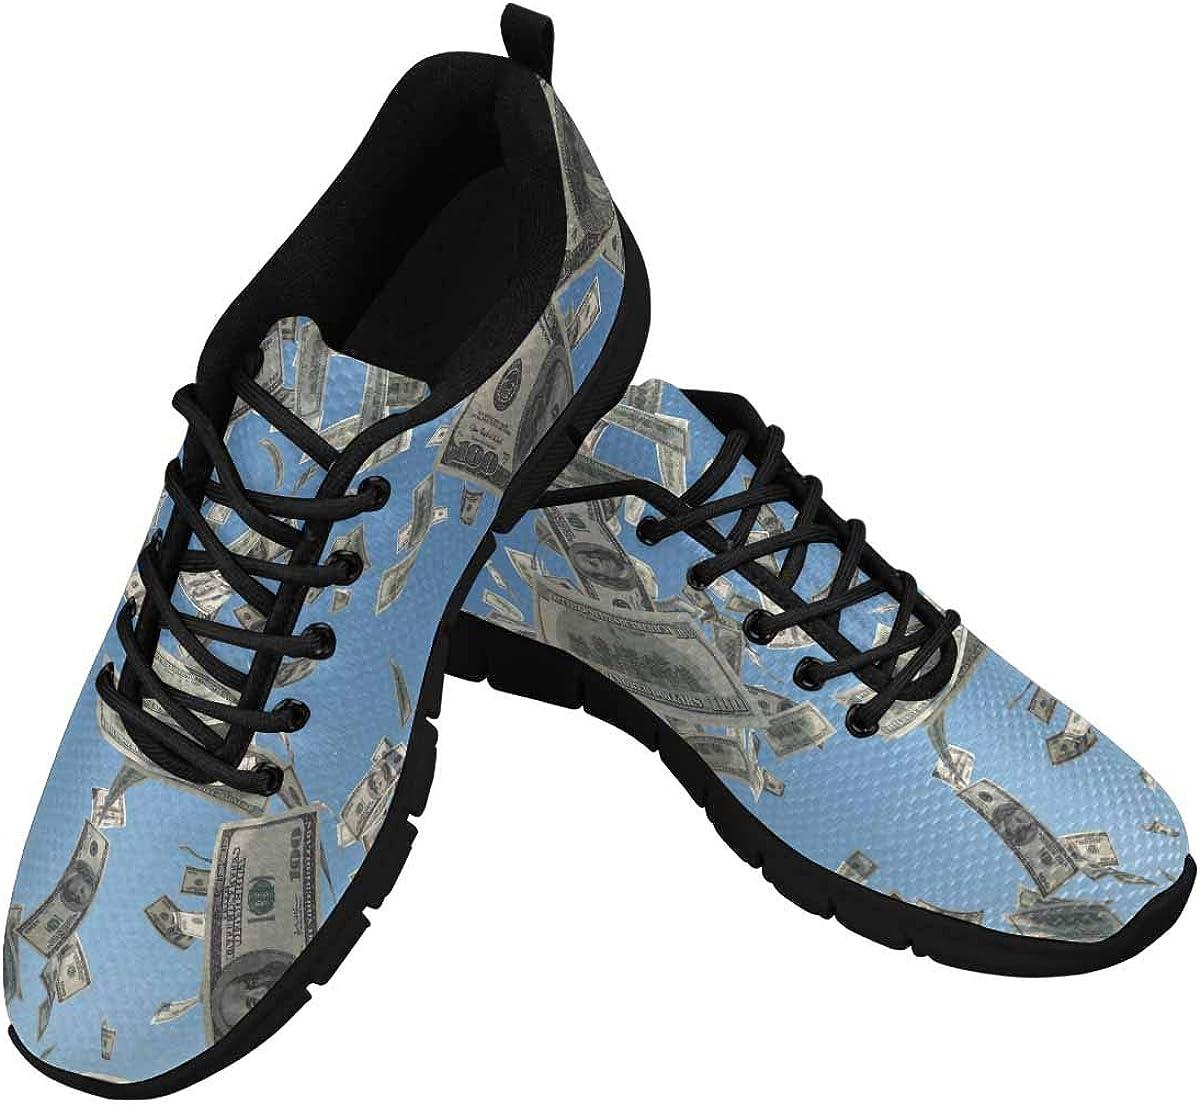 InterestPrint Bills Flying on Blue Sky Women's Athletic Walking Shoes Breathe Comfort Mesh